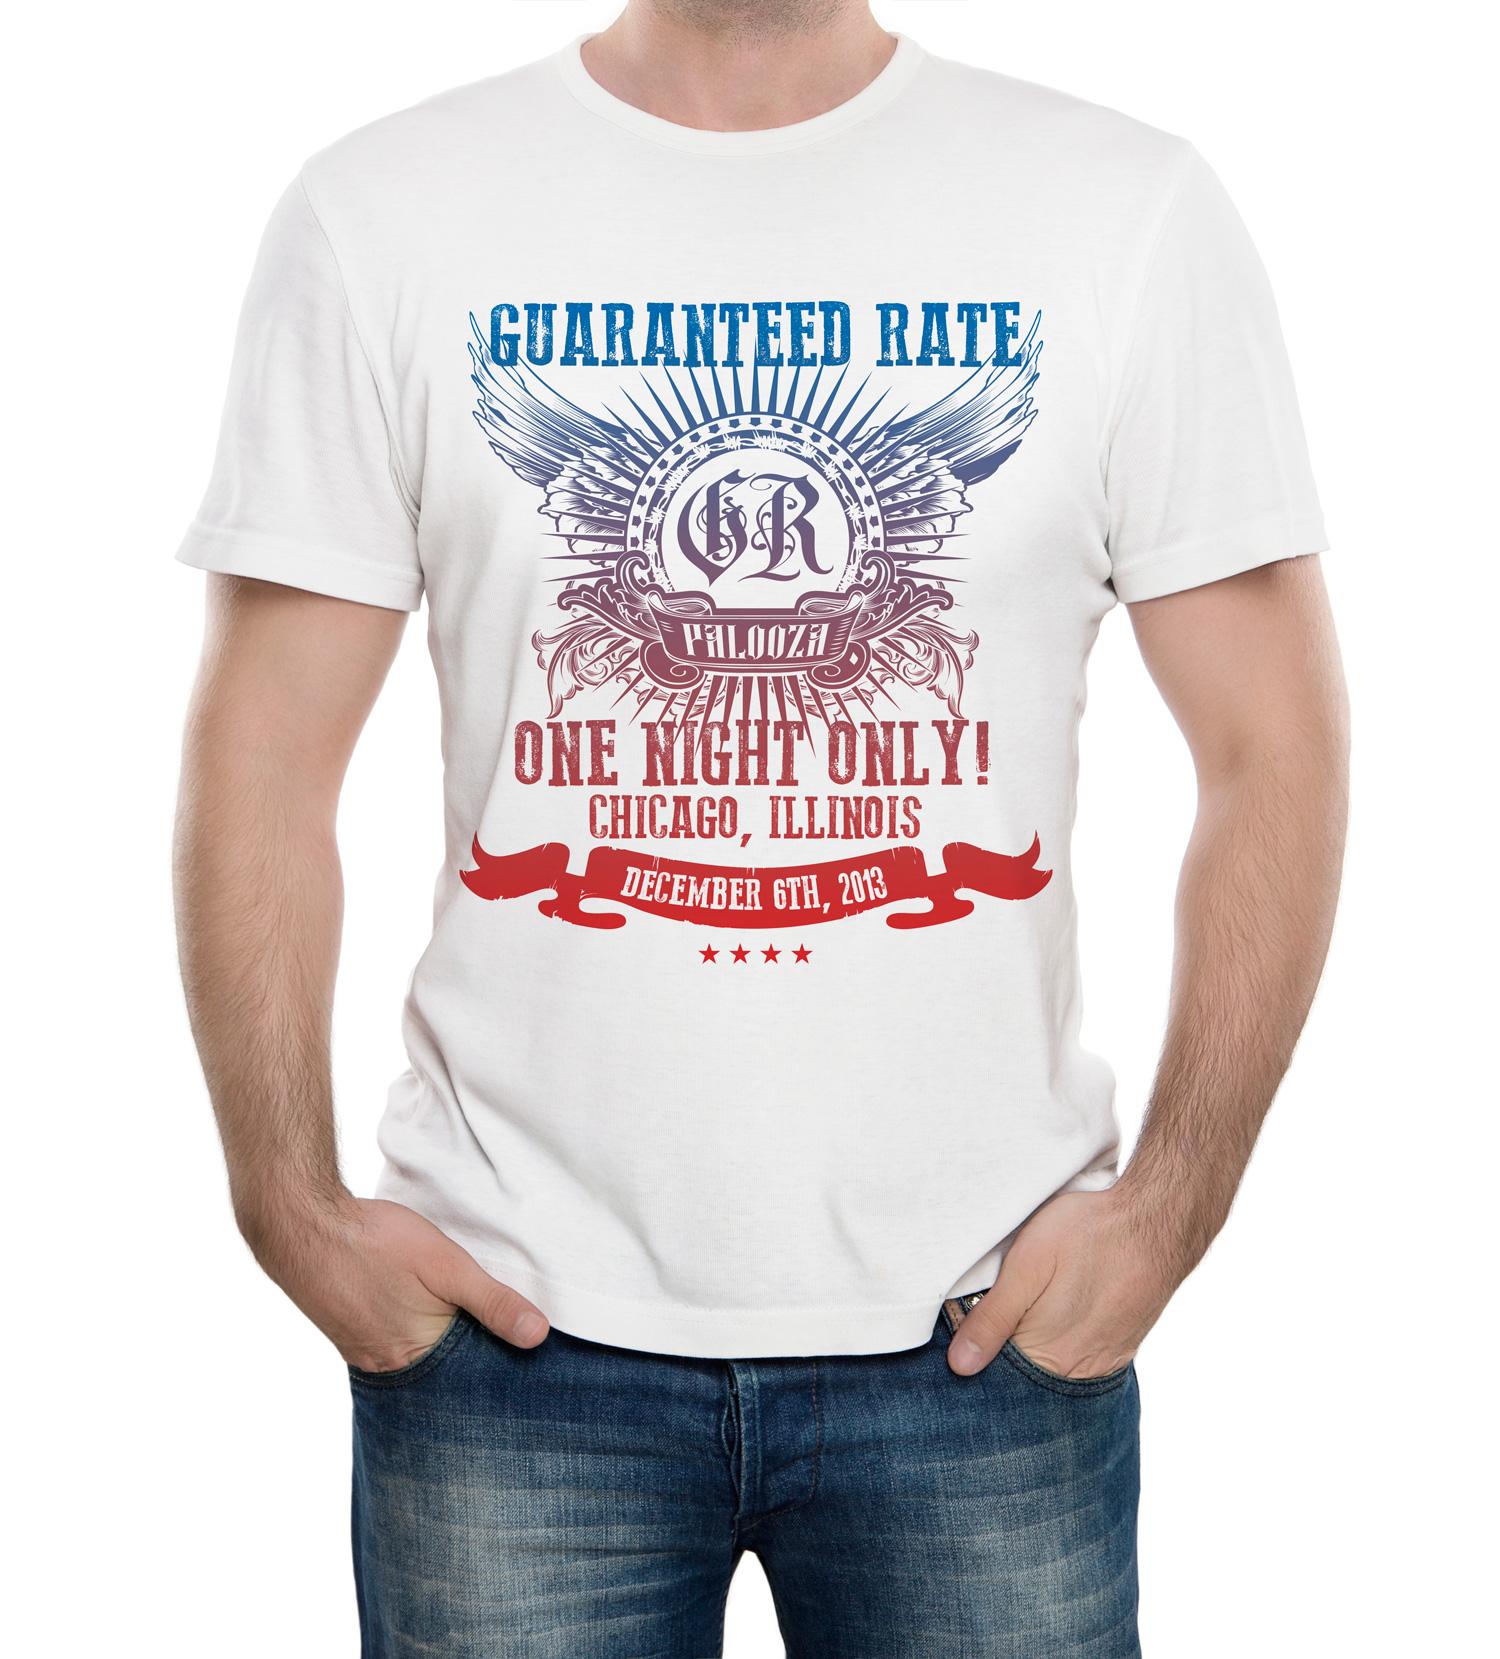 guaranteedrate_04.jpg